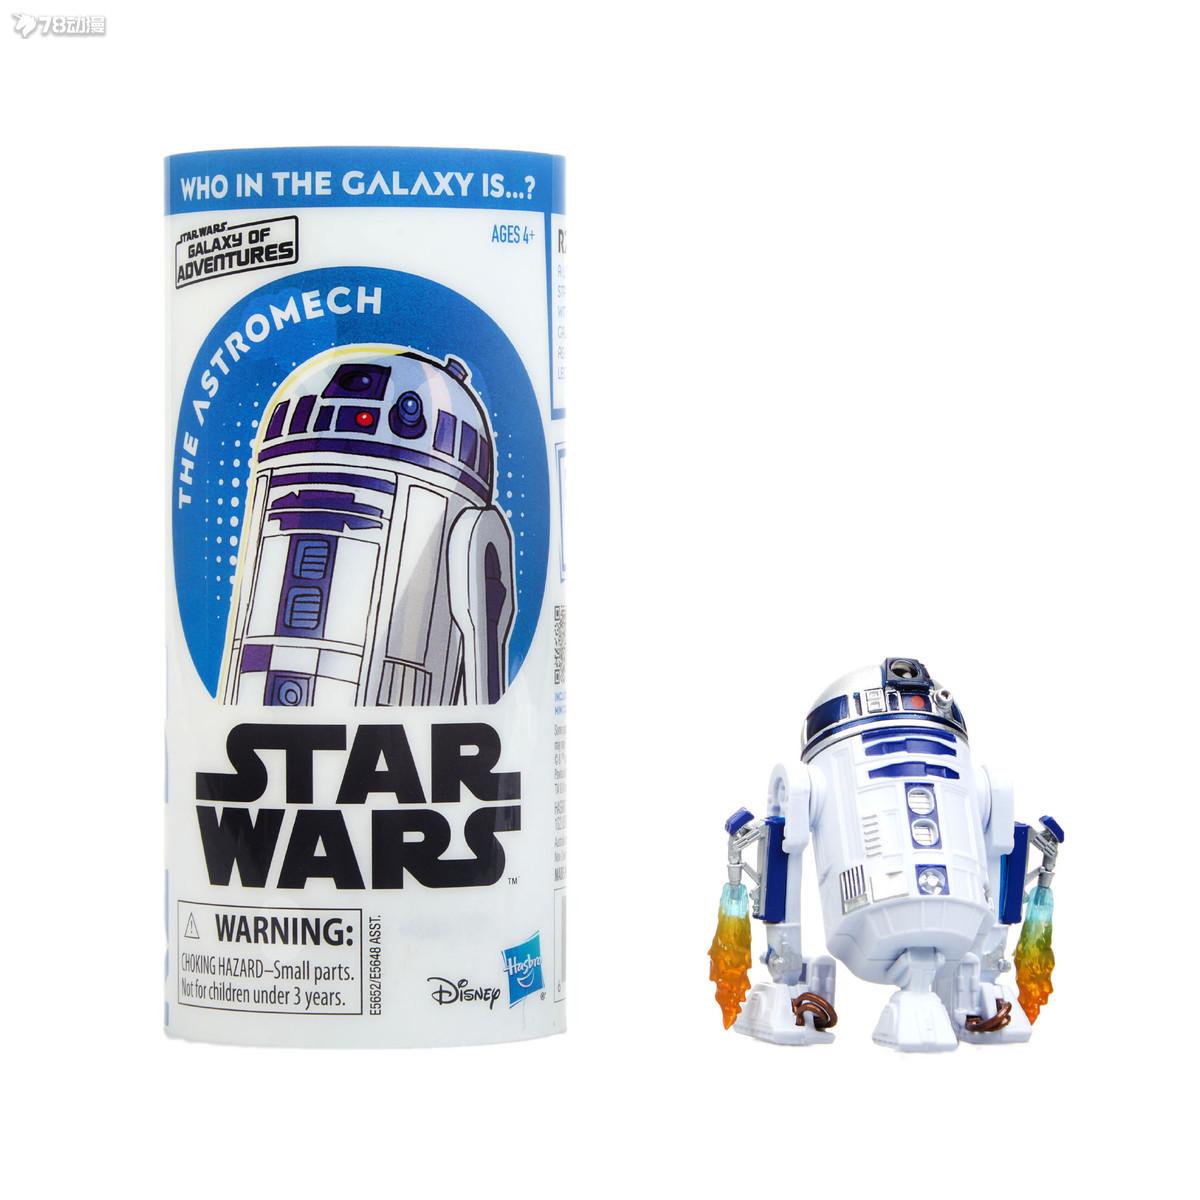 Star-Wars-Galaxy-Adventures-011.jpg